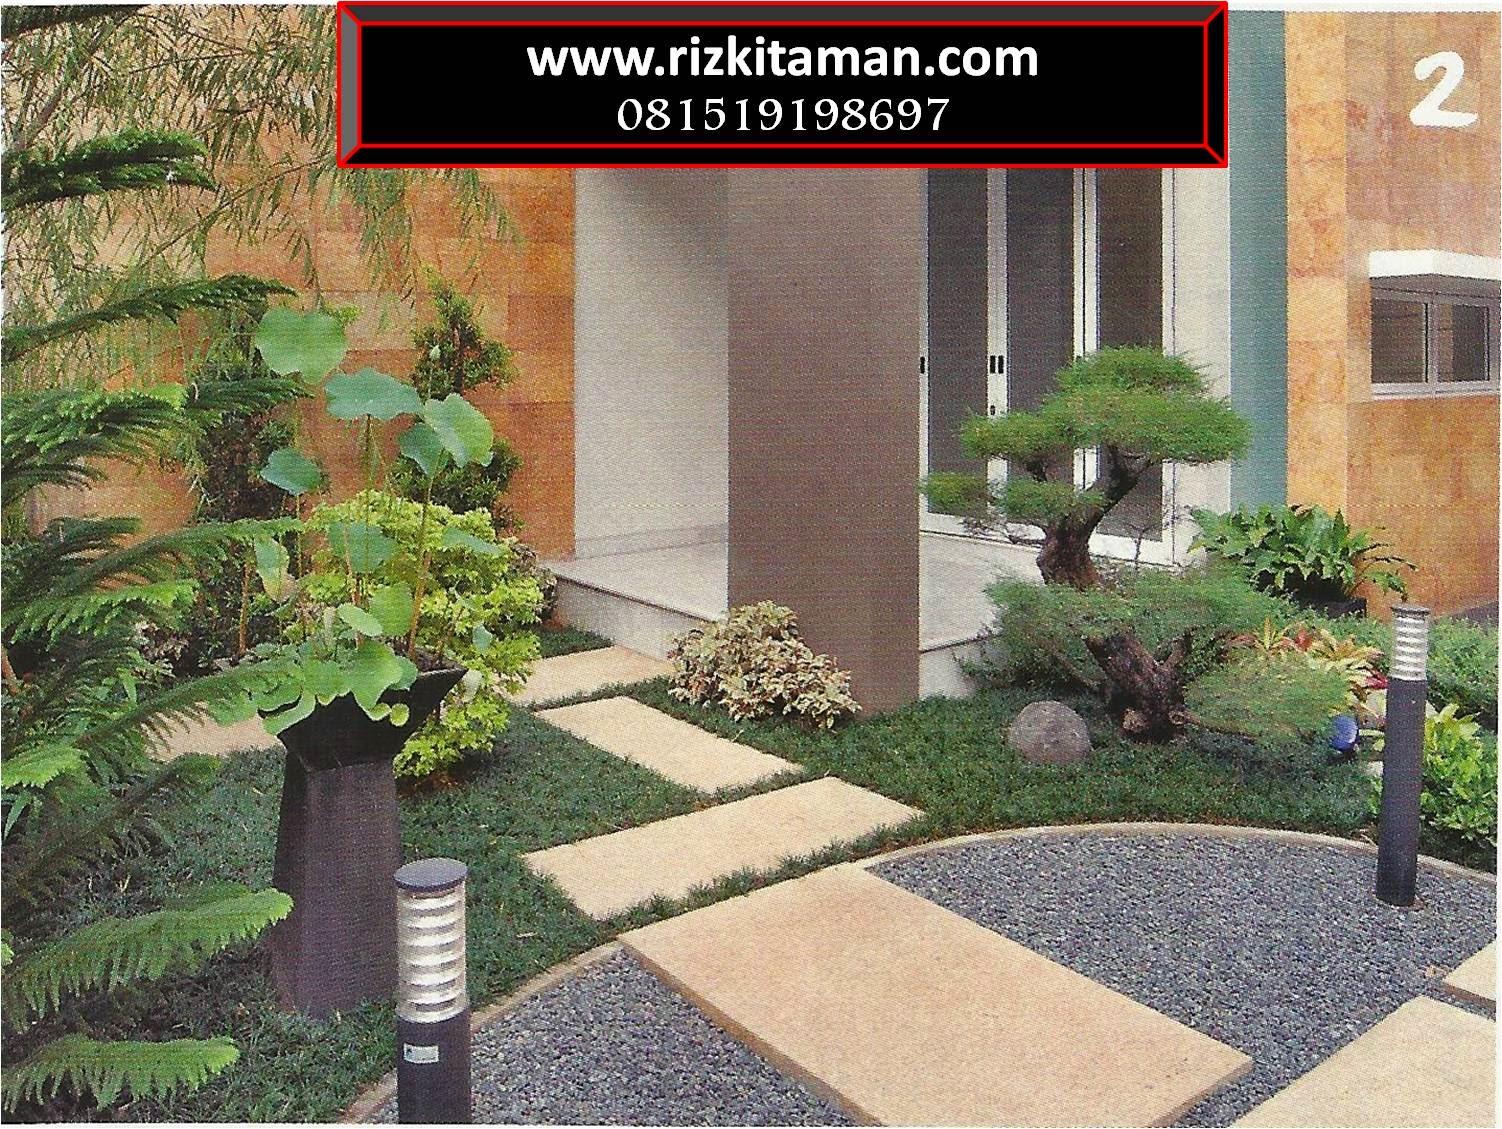 Tukang taman rumahan | jasa penanaman rumput dan pembuatan taman minimalis